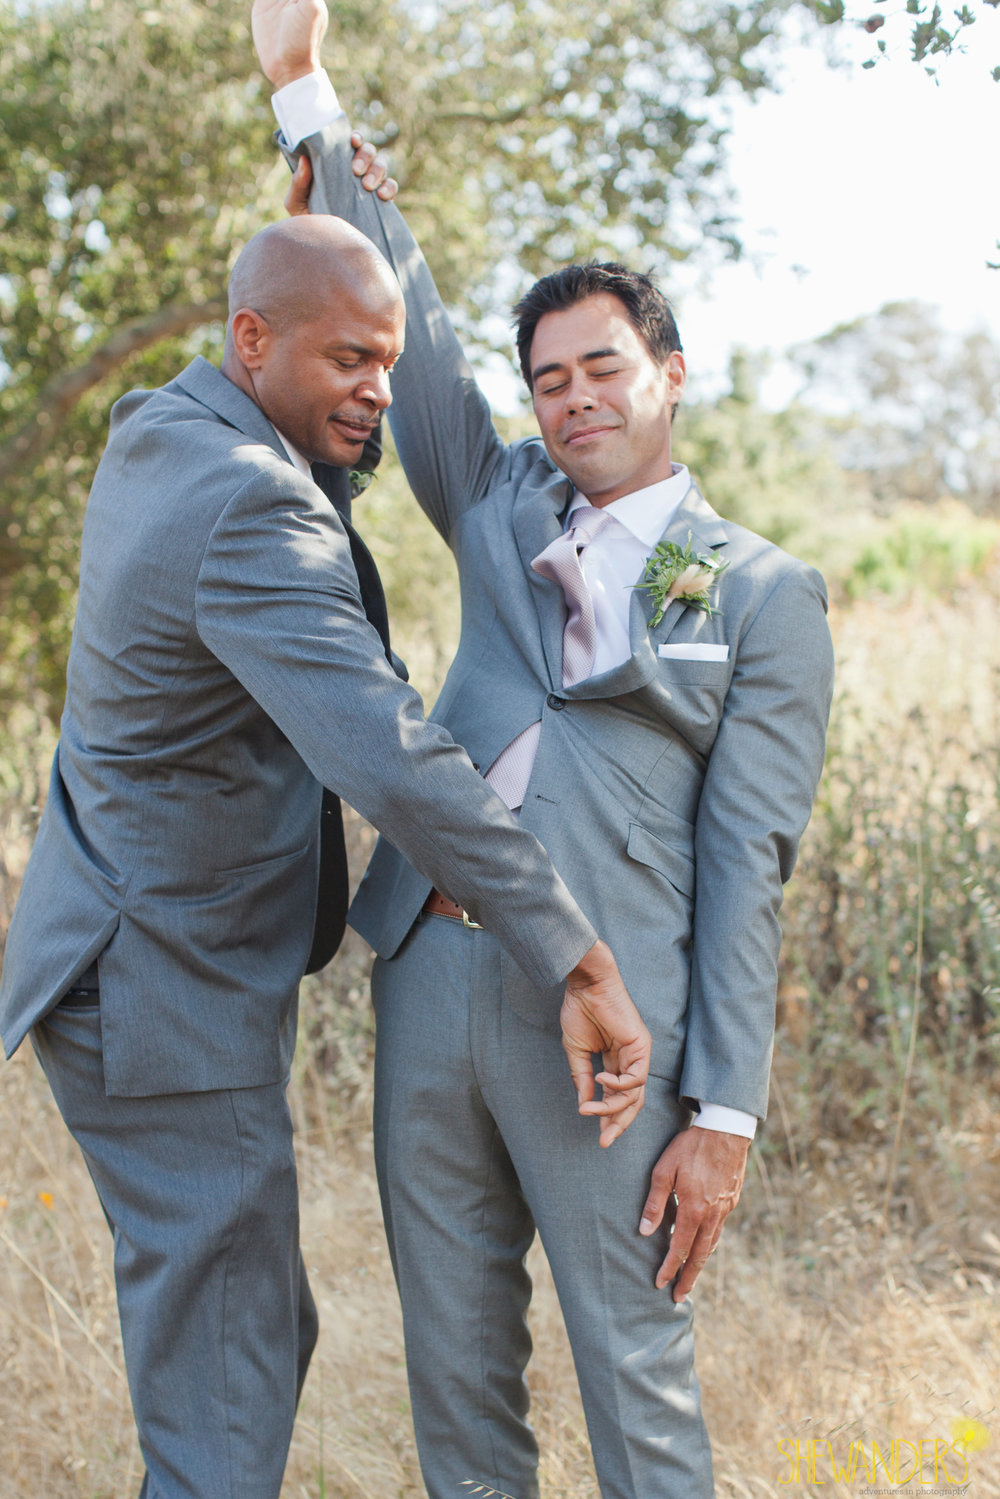 1030.Shewanders.TammiWalter.Wedding.SanDiego_1030.jpg.TammiWalter.Wedding.SanDiego_1030.jpg